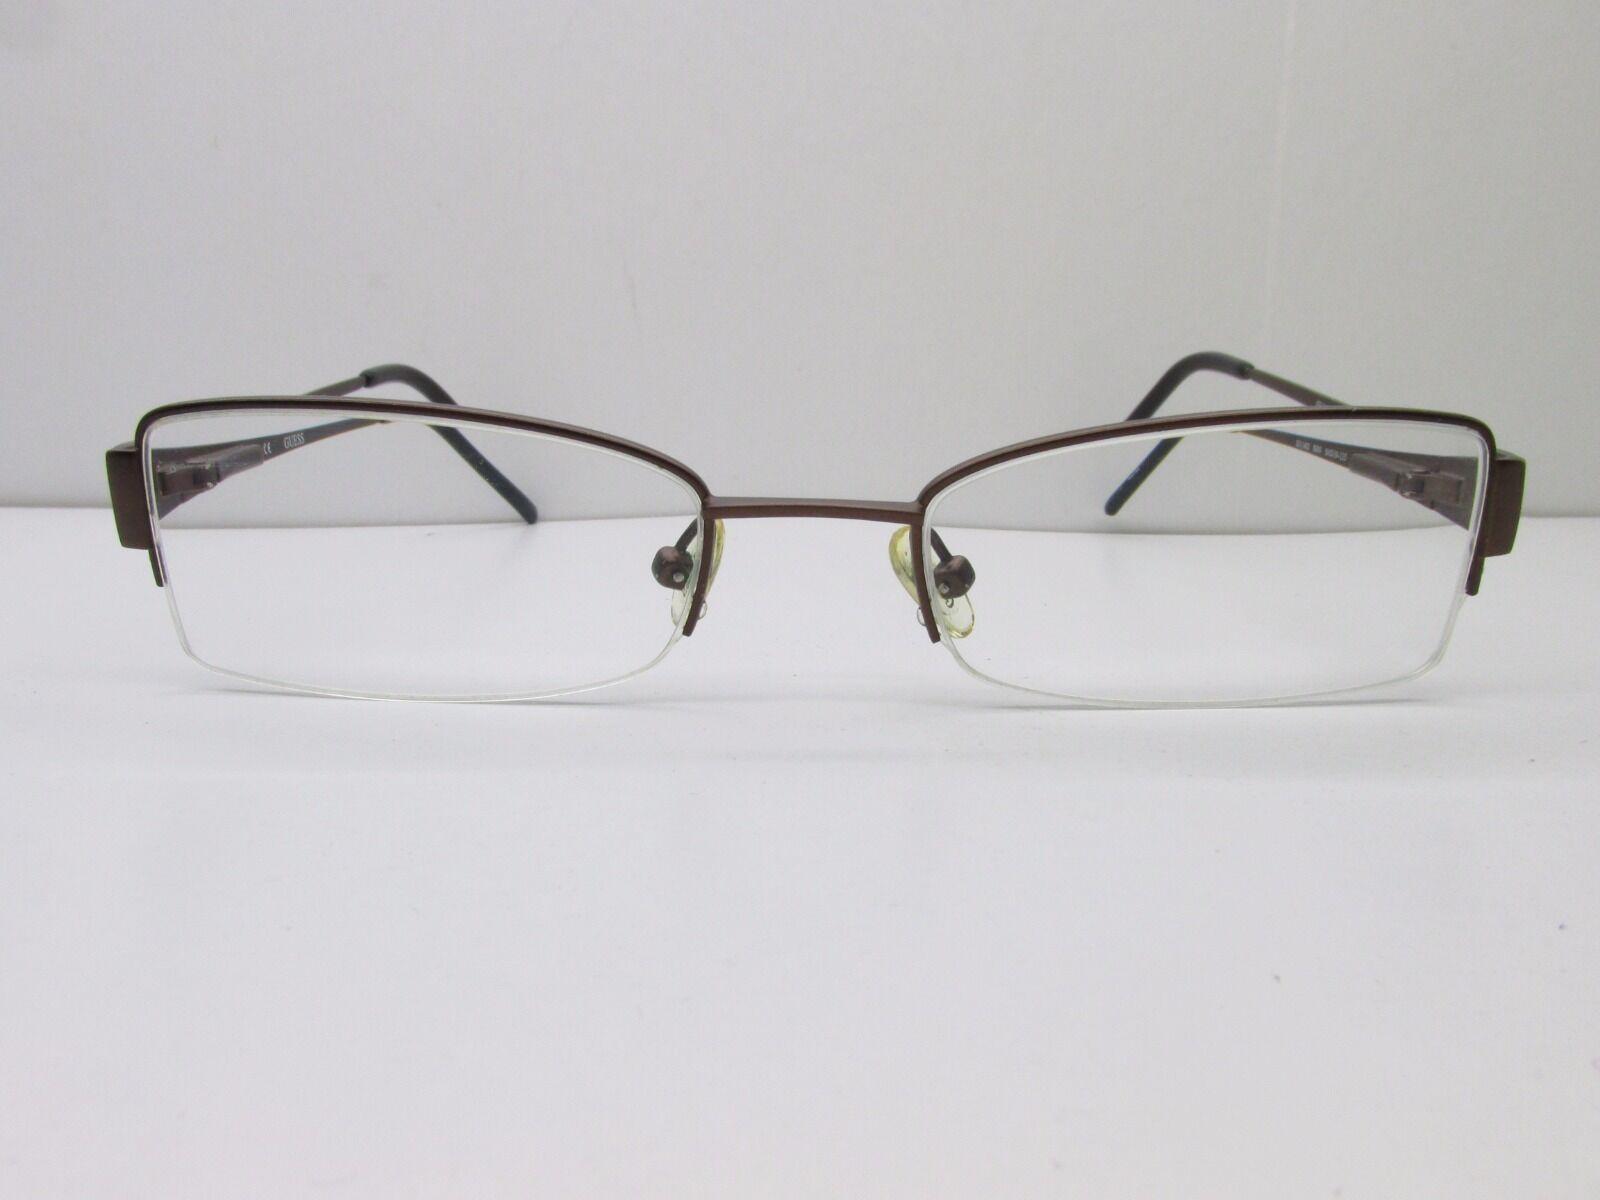 GUESS GU 1482 Eyeglasses Frames 50-19-135 Brown Half Rimless Tv6 ...